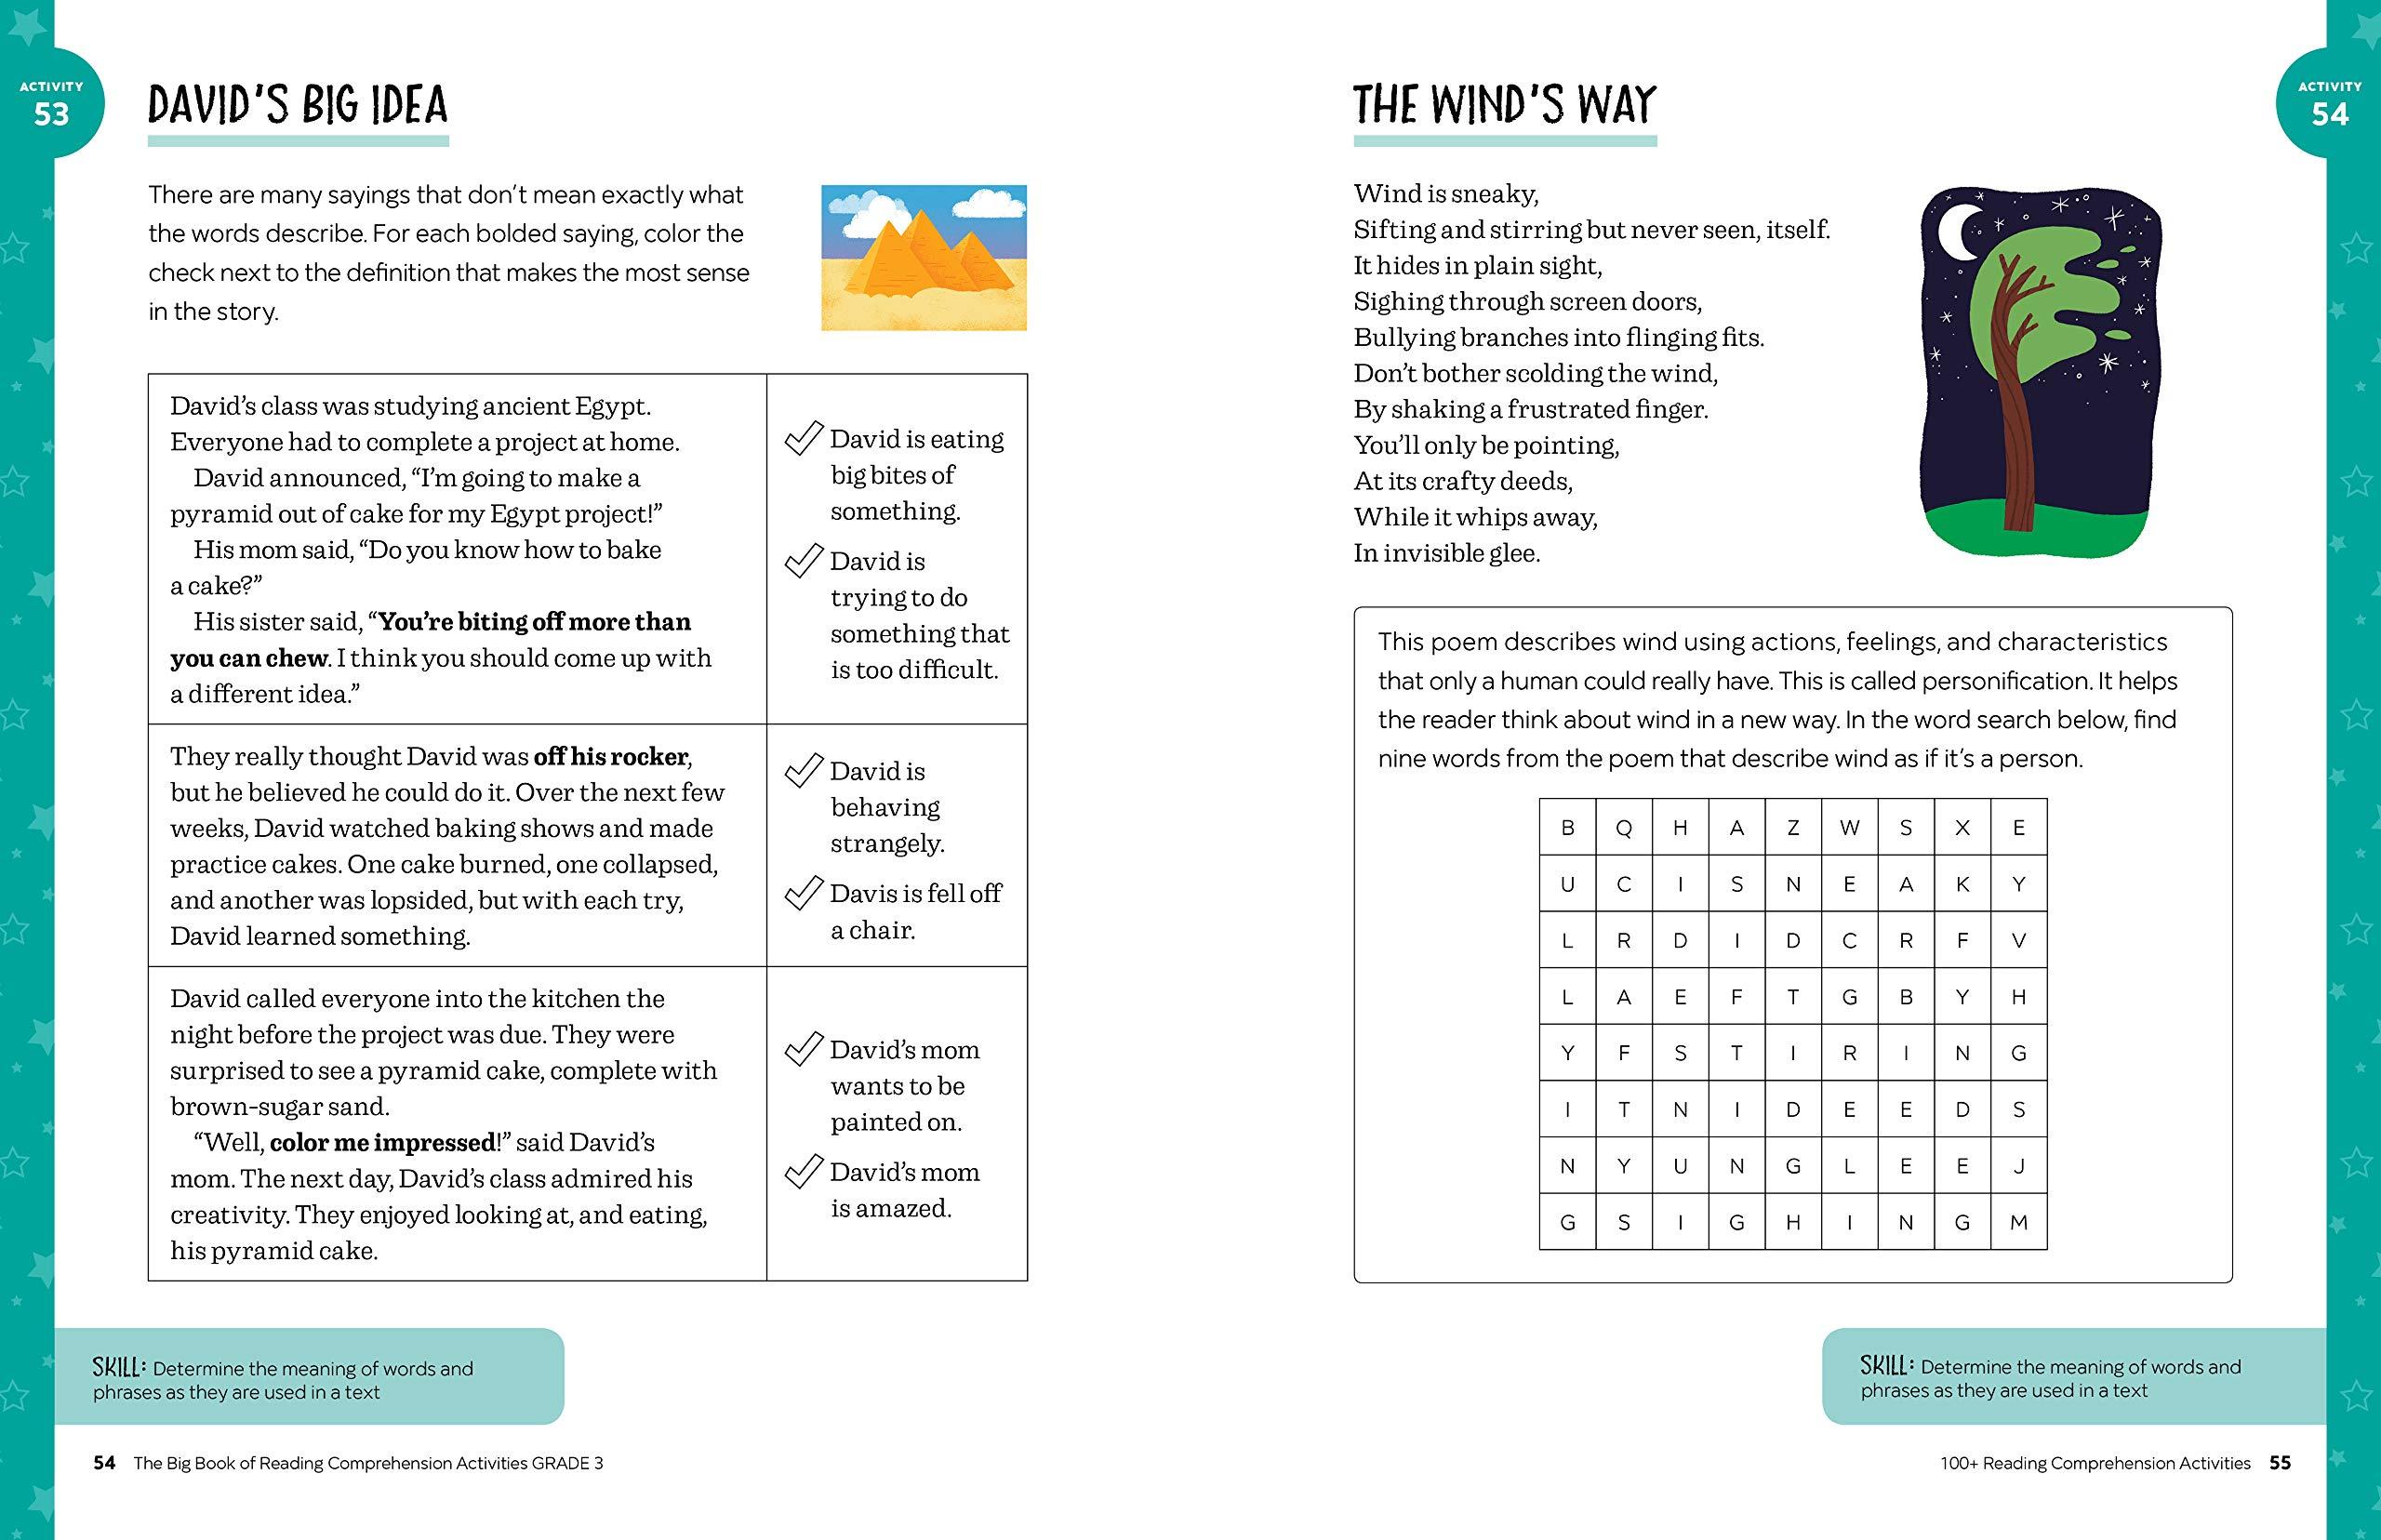 - Amazon.com: The Big Book Of Reading Comprehension Activities